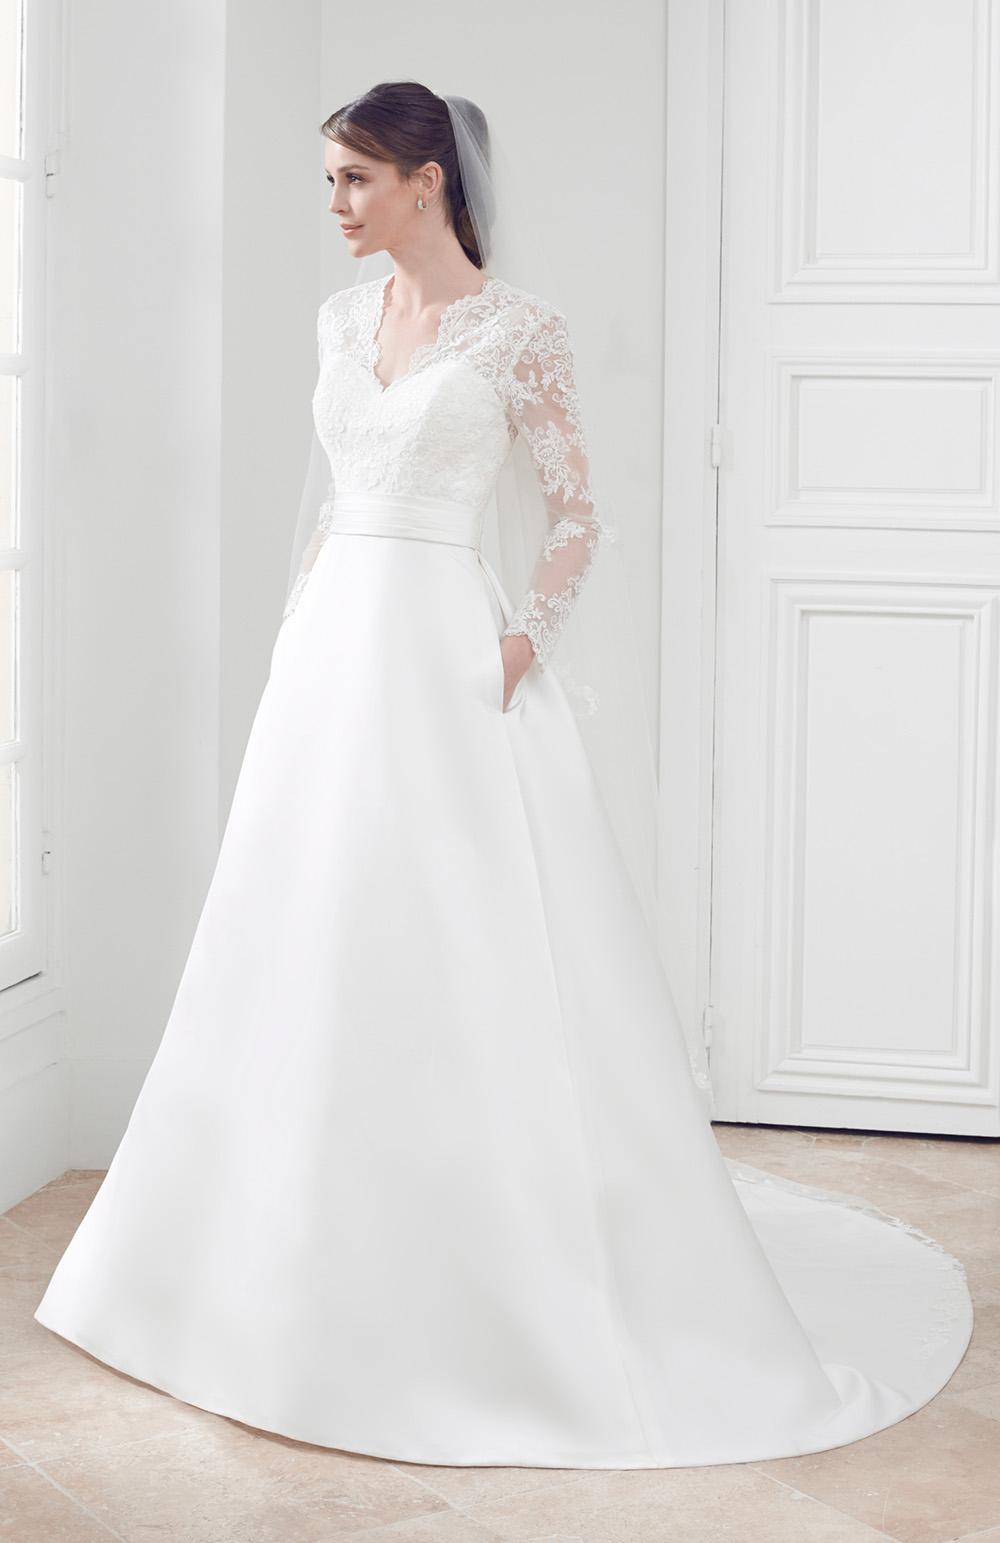 Robe de mariée Modèle Oriane